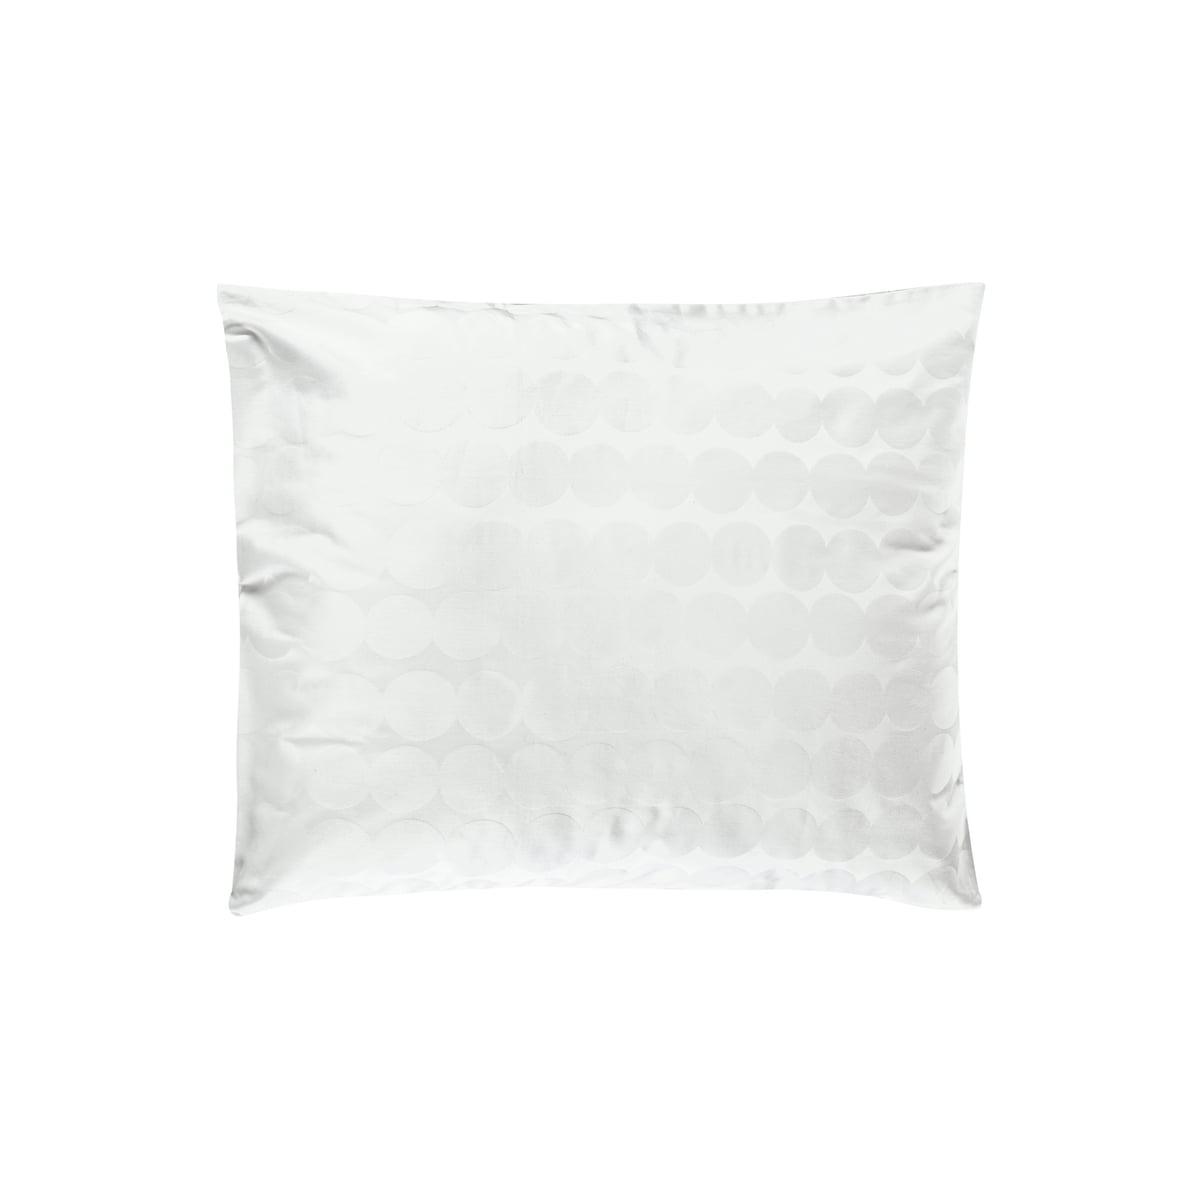 Marimekko - Räsymatto Kopfkissenbezug 50 x 60 cm, weiß